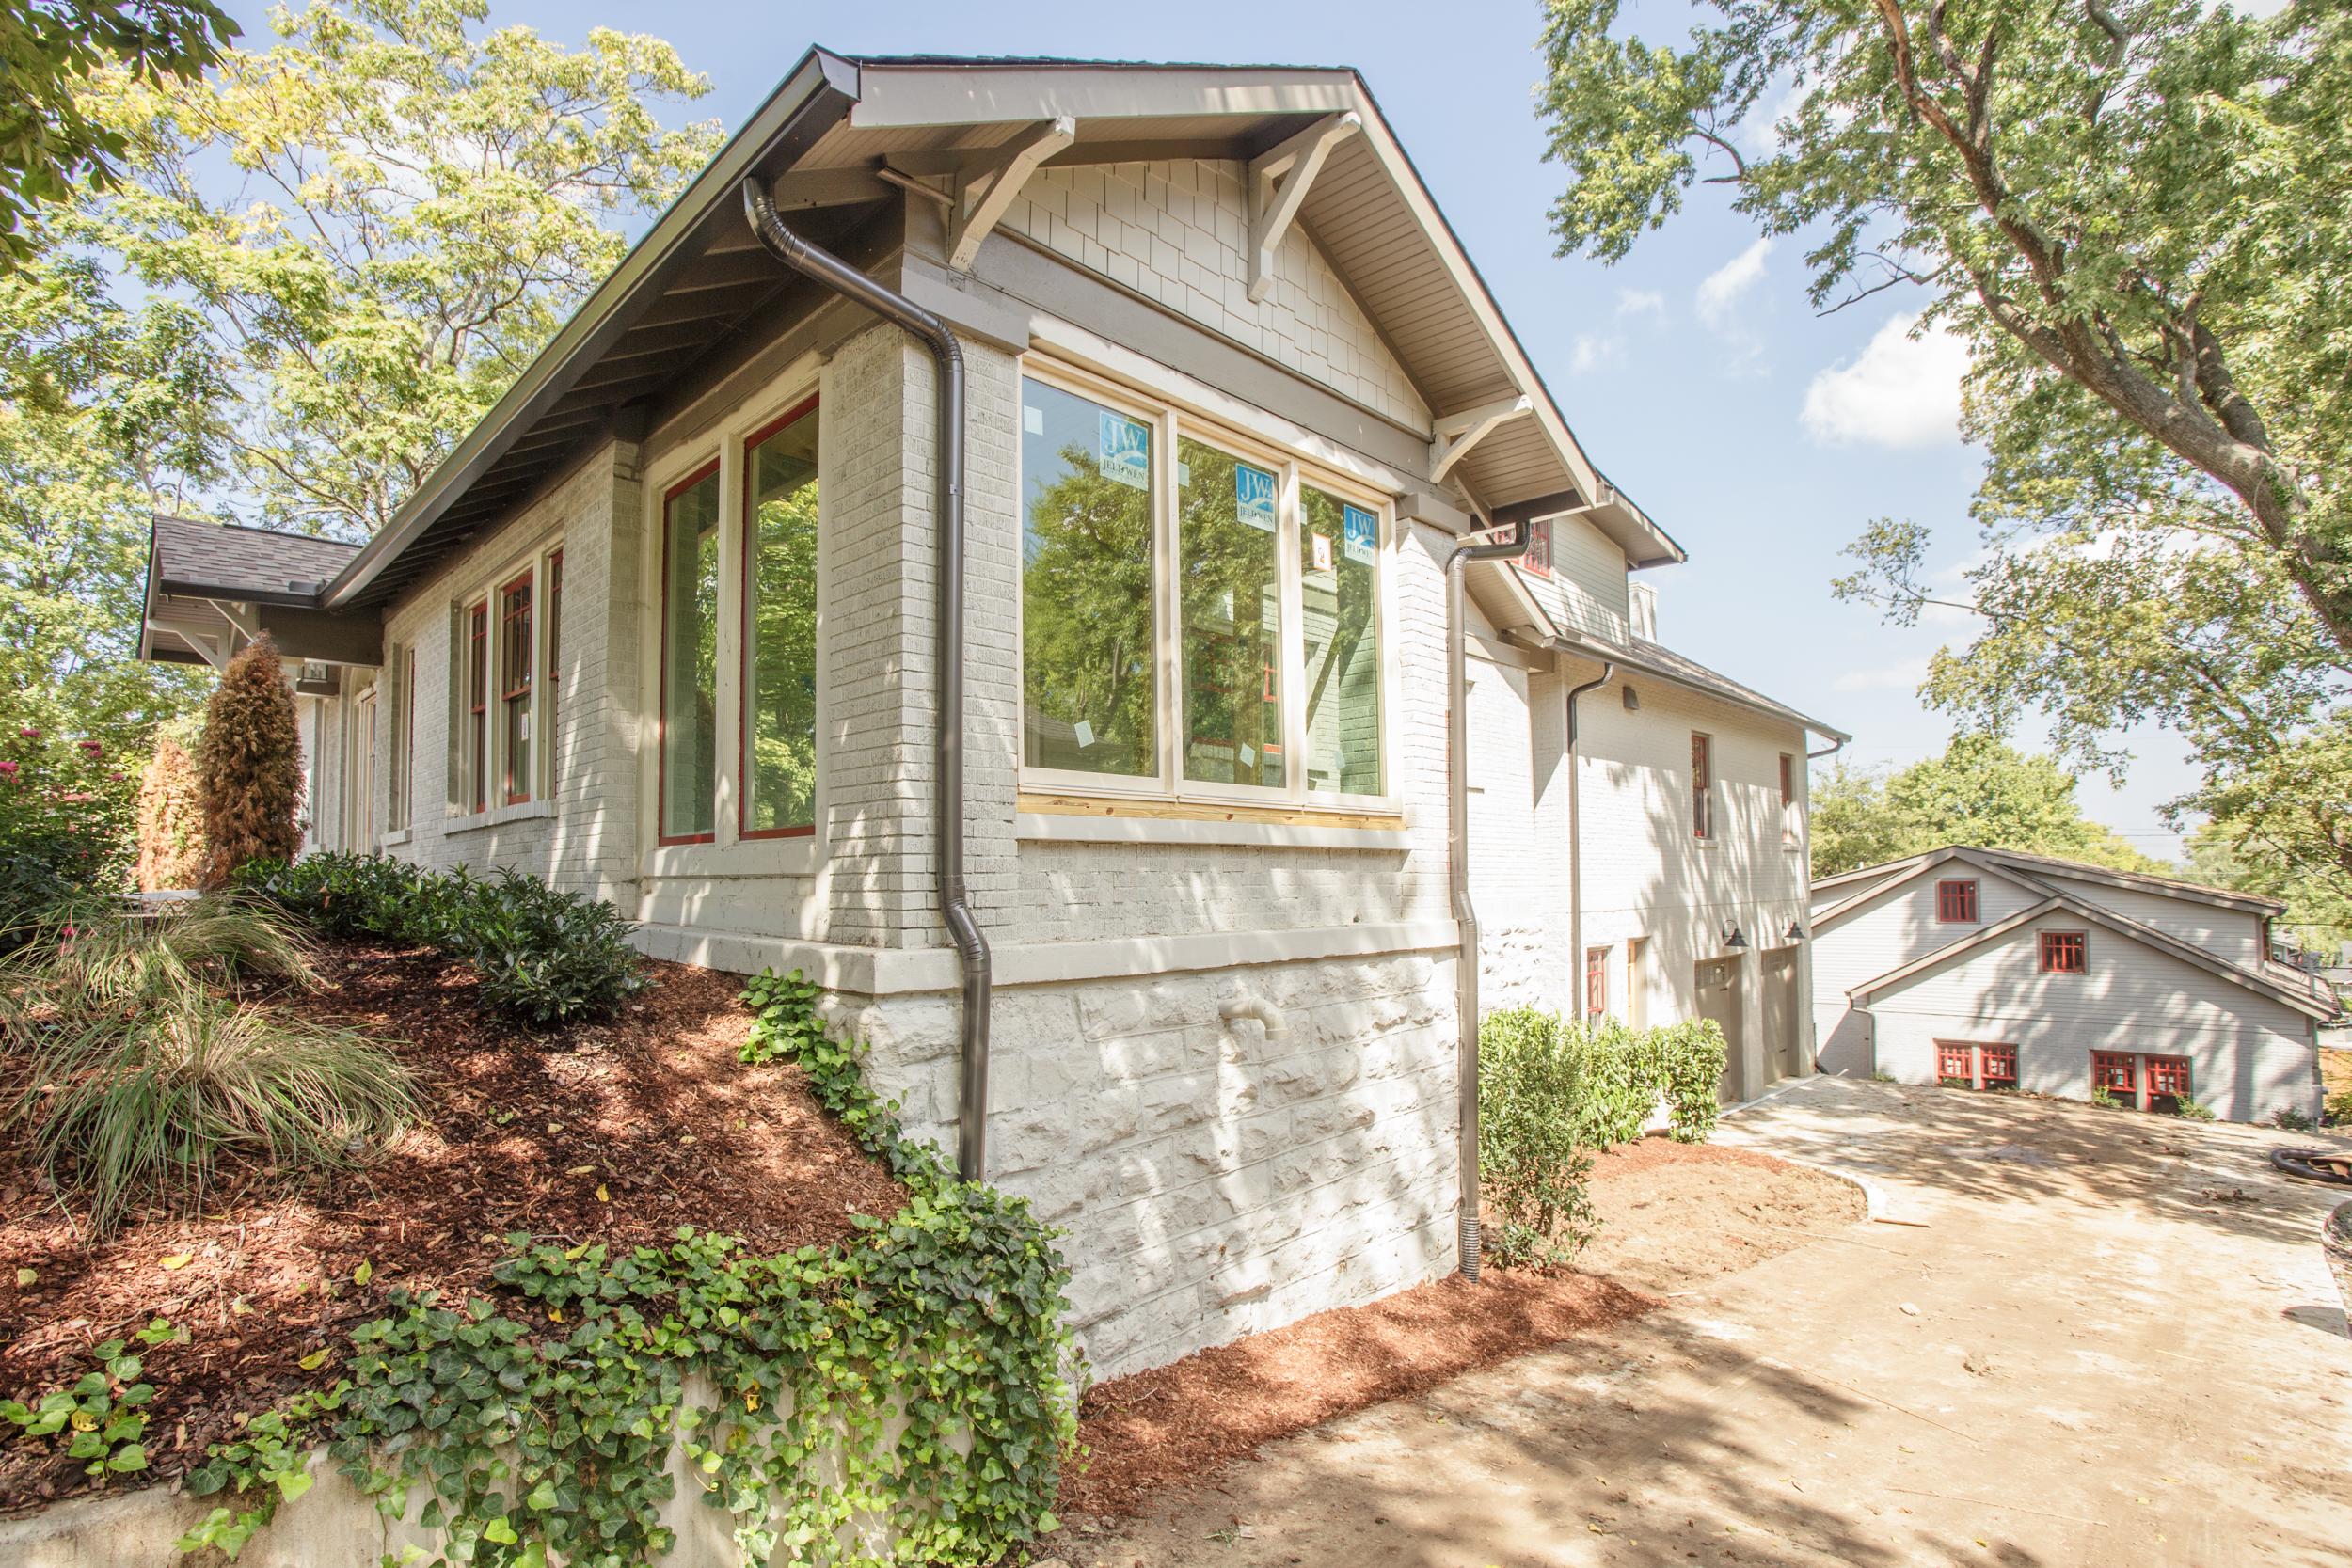 best-home-builder-nashville-renovation-historic-neighborhoods-britt-development-group-0219.jpg